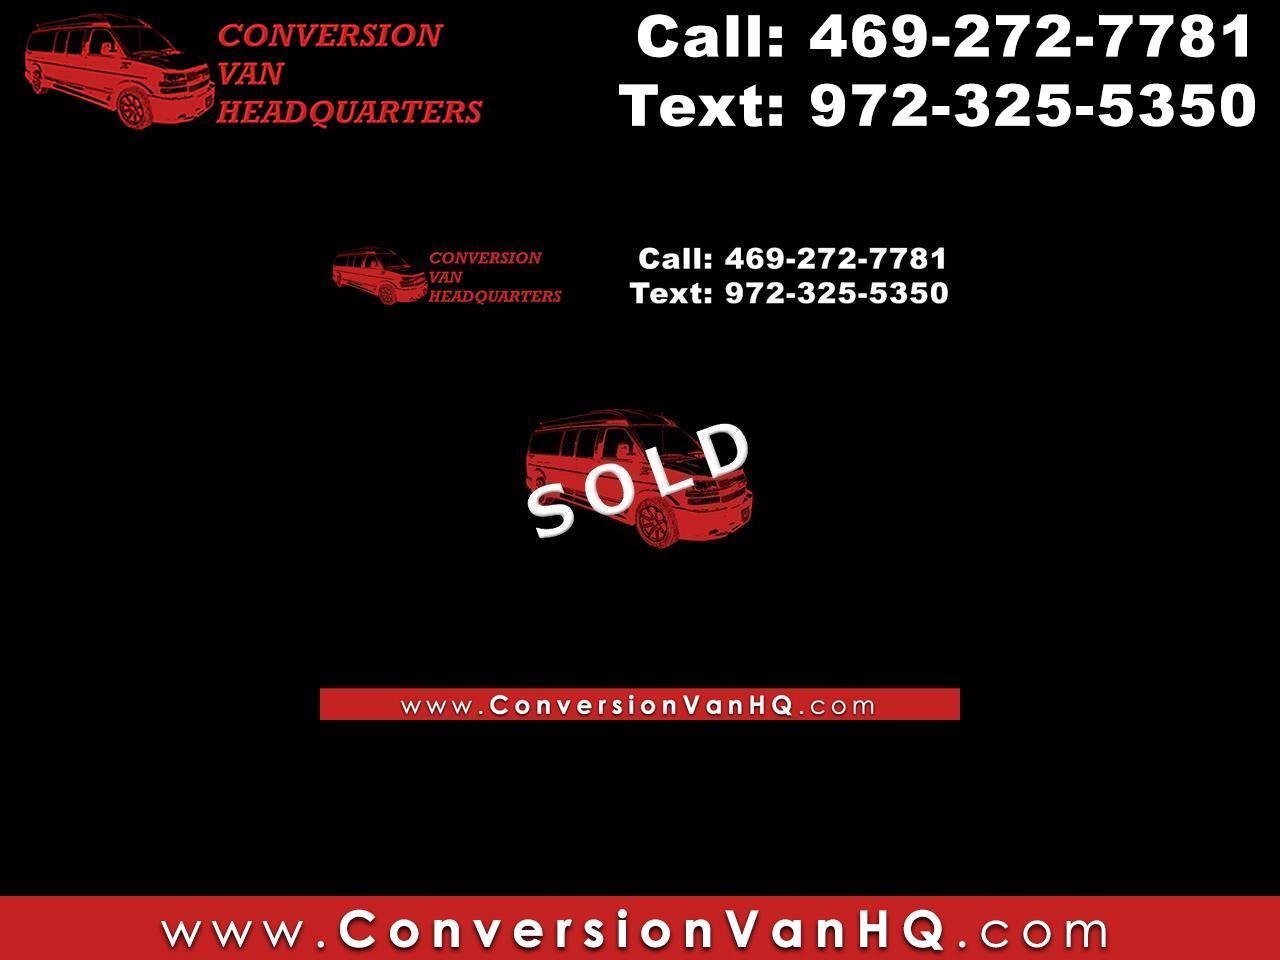 2007 Chevrolet Express Diesel Explorer Hightop Conversion Van!